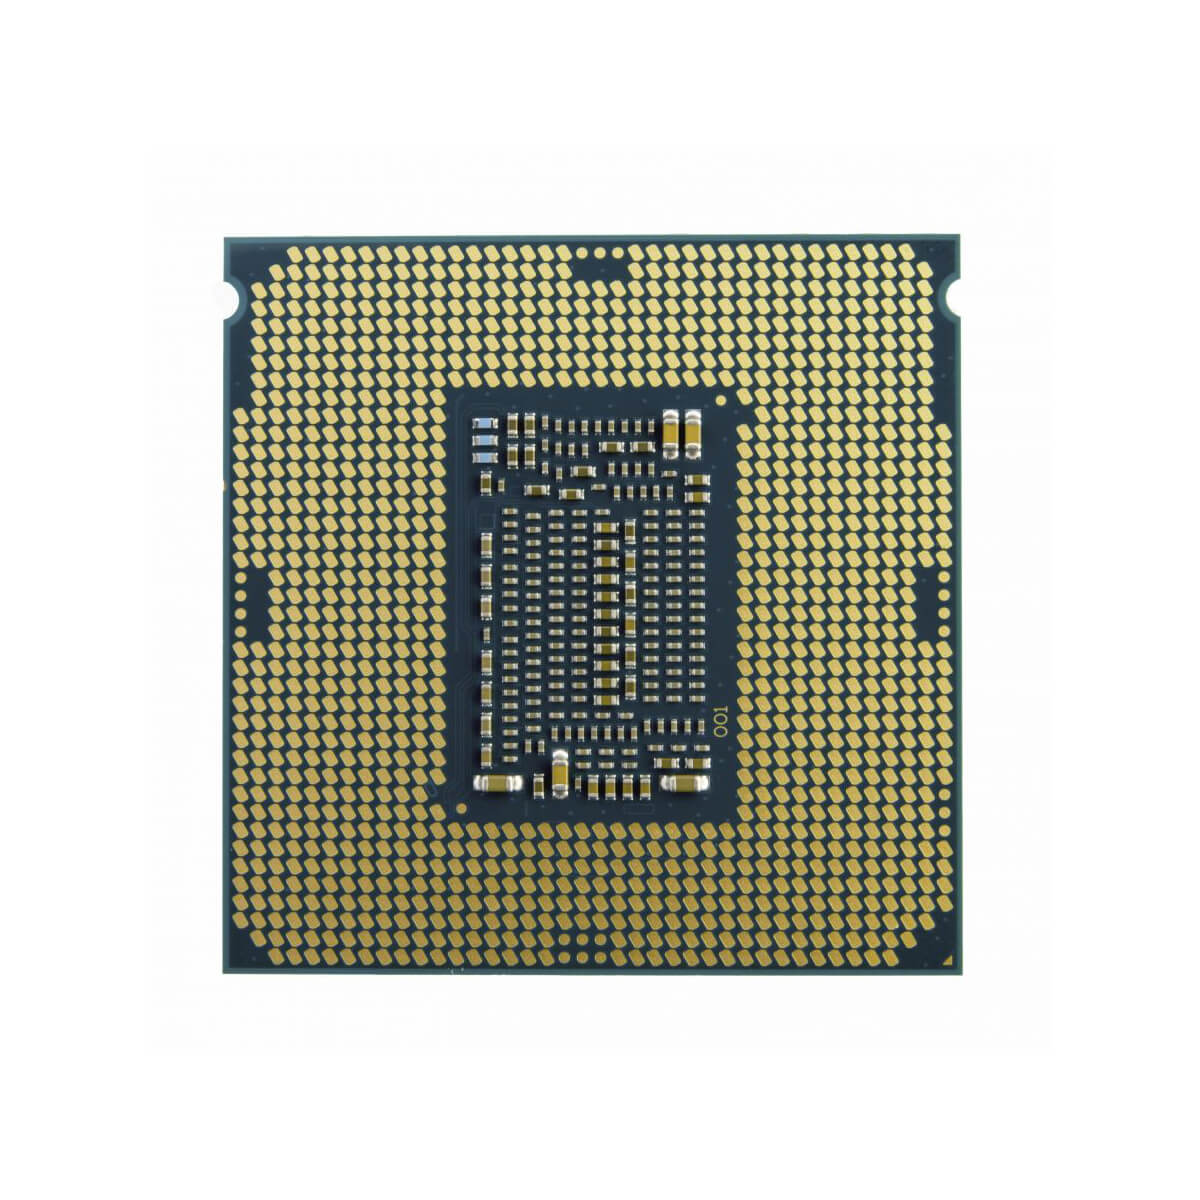 BX80701G5925-03